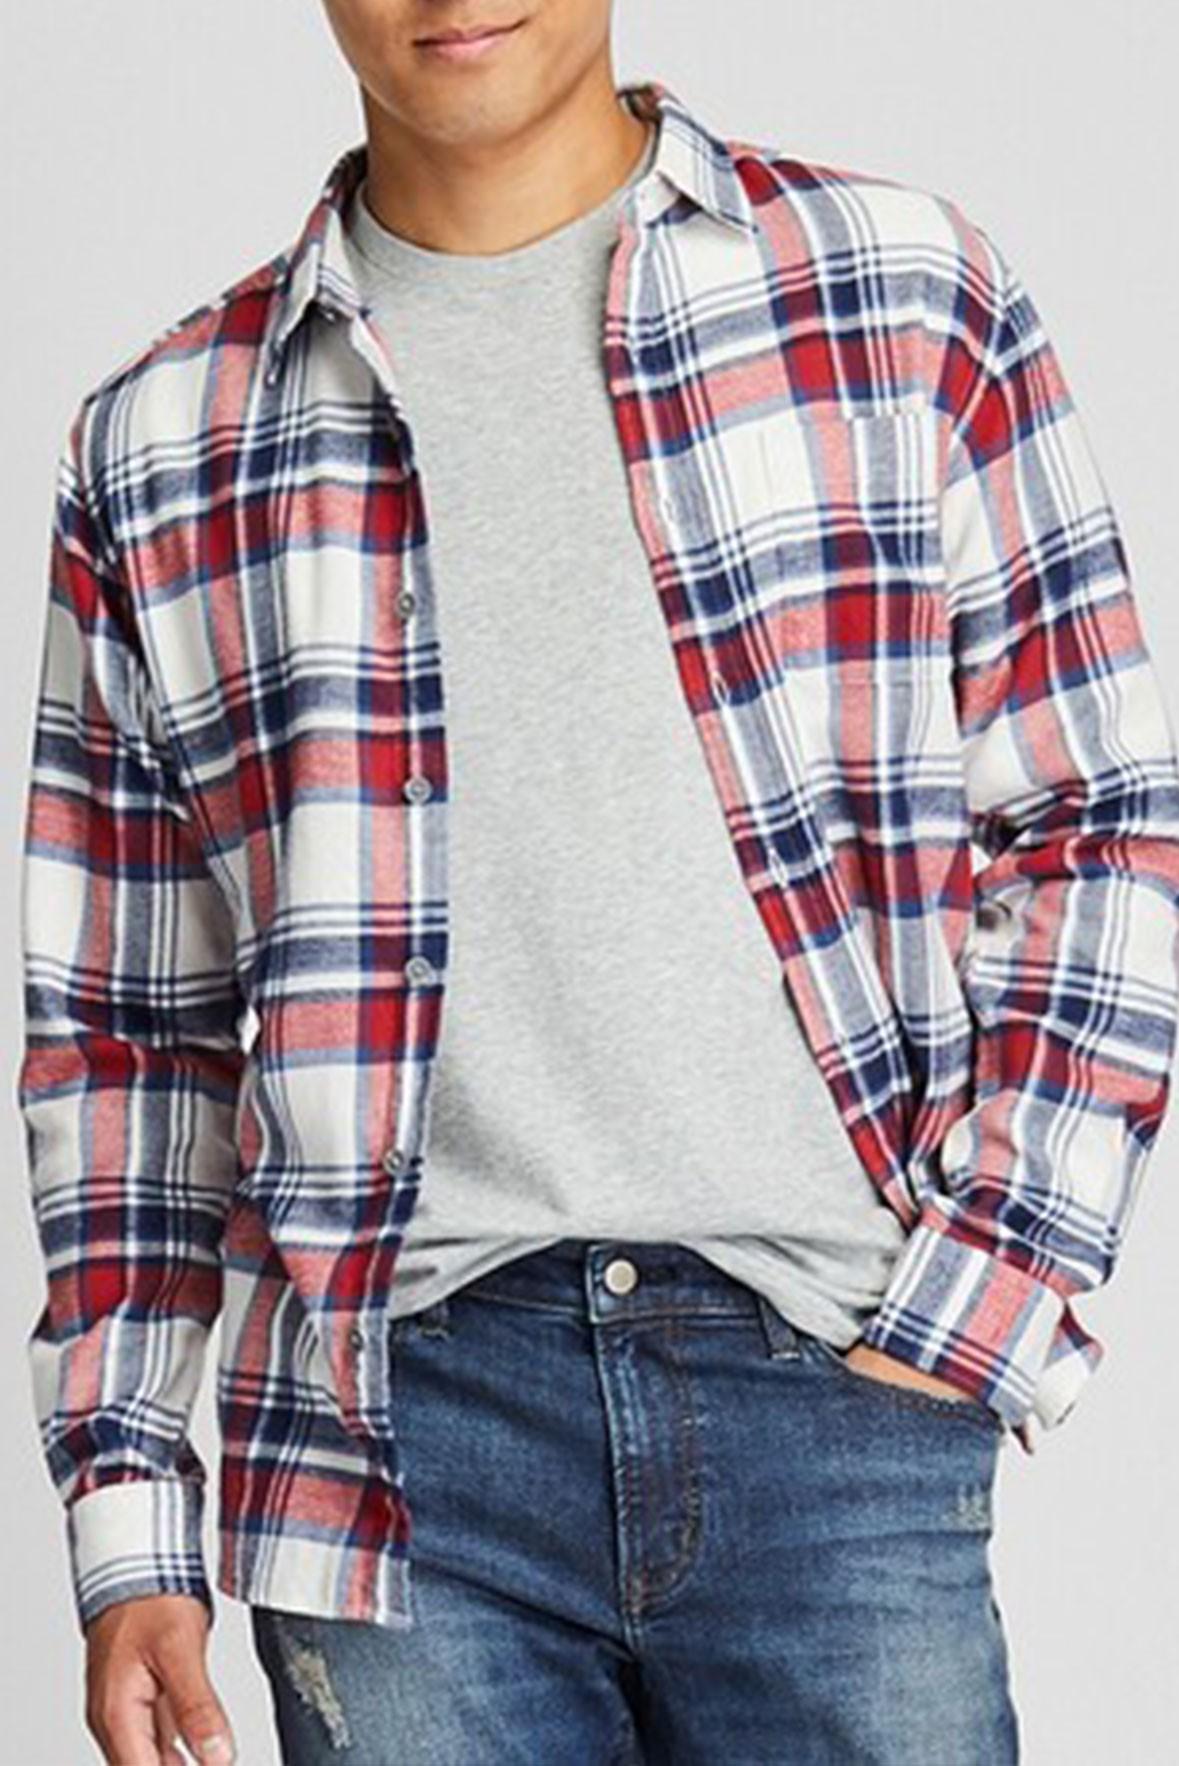 Men's Basic Full Sleeves Blue and Red Check Shirt S197